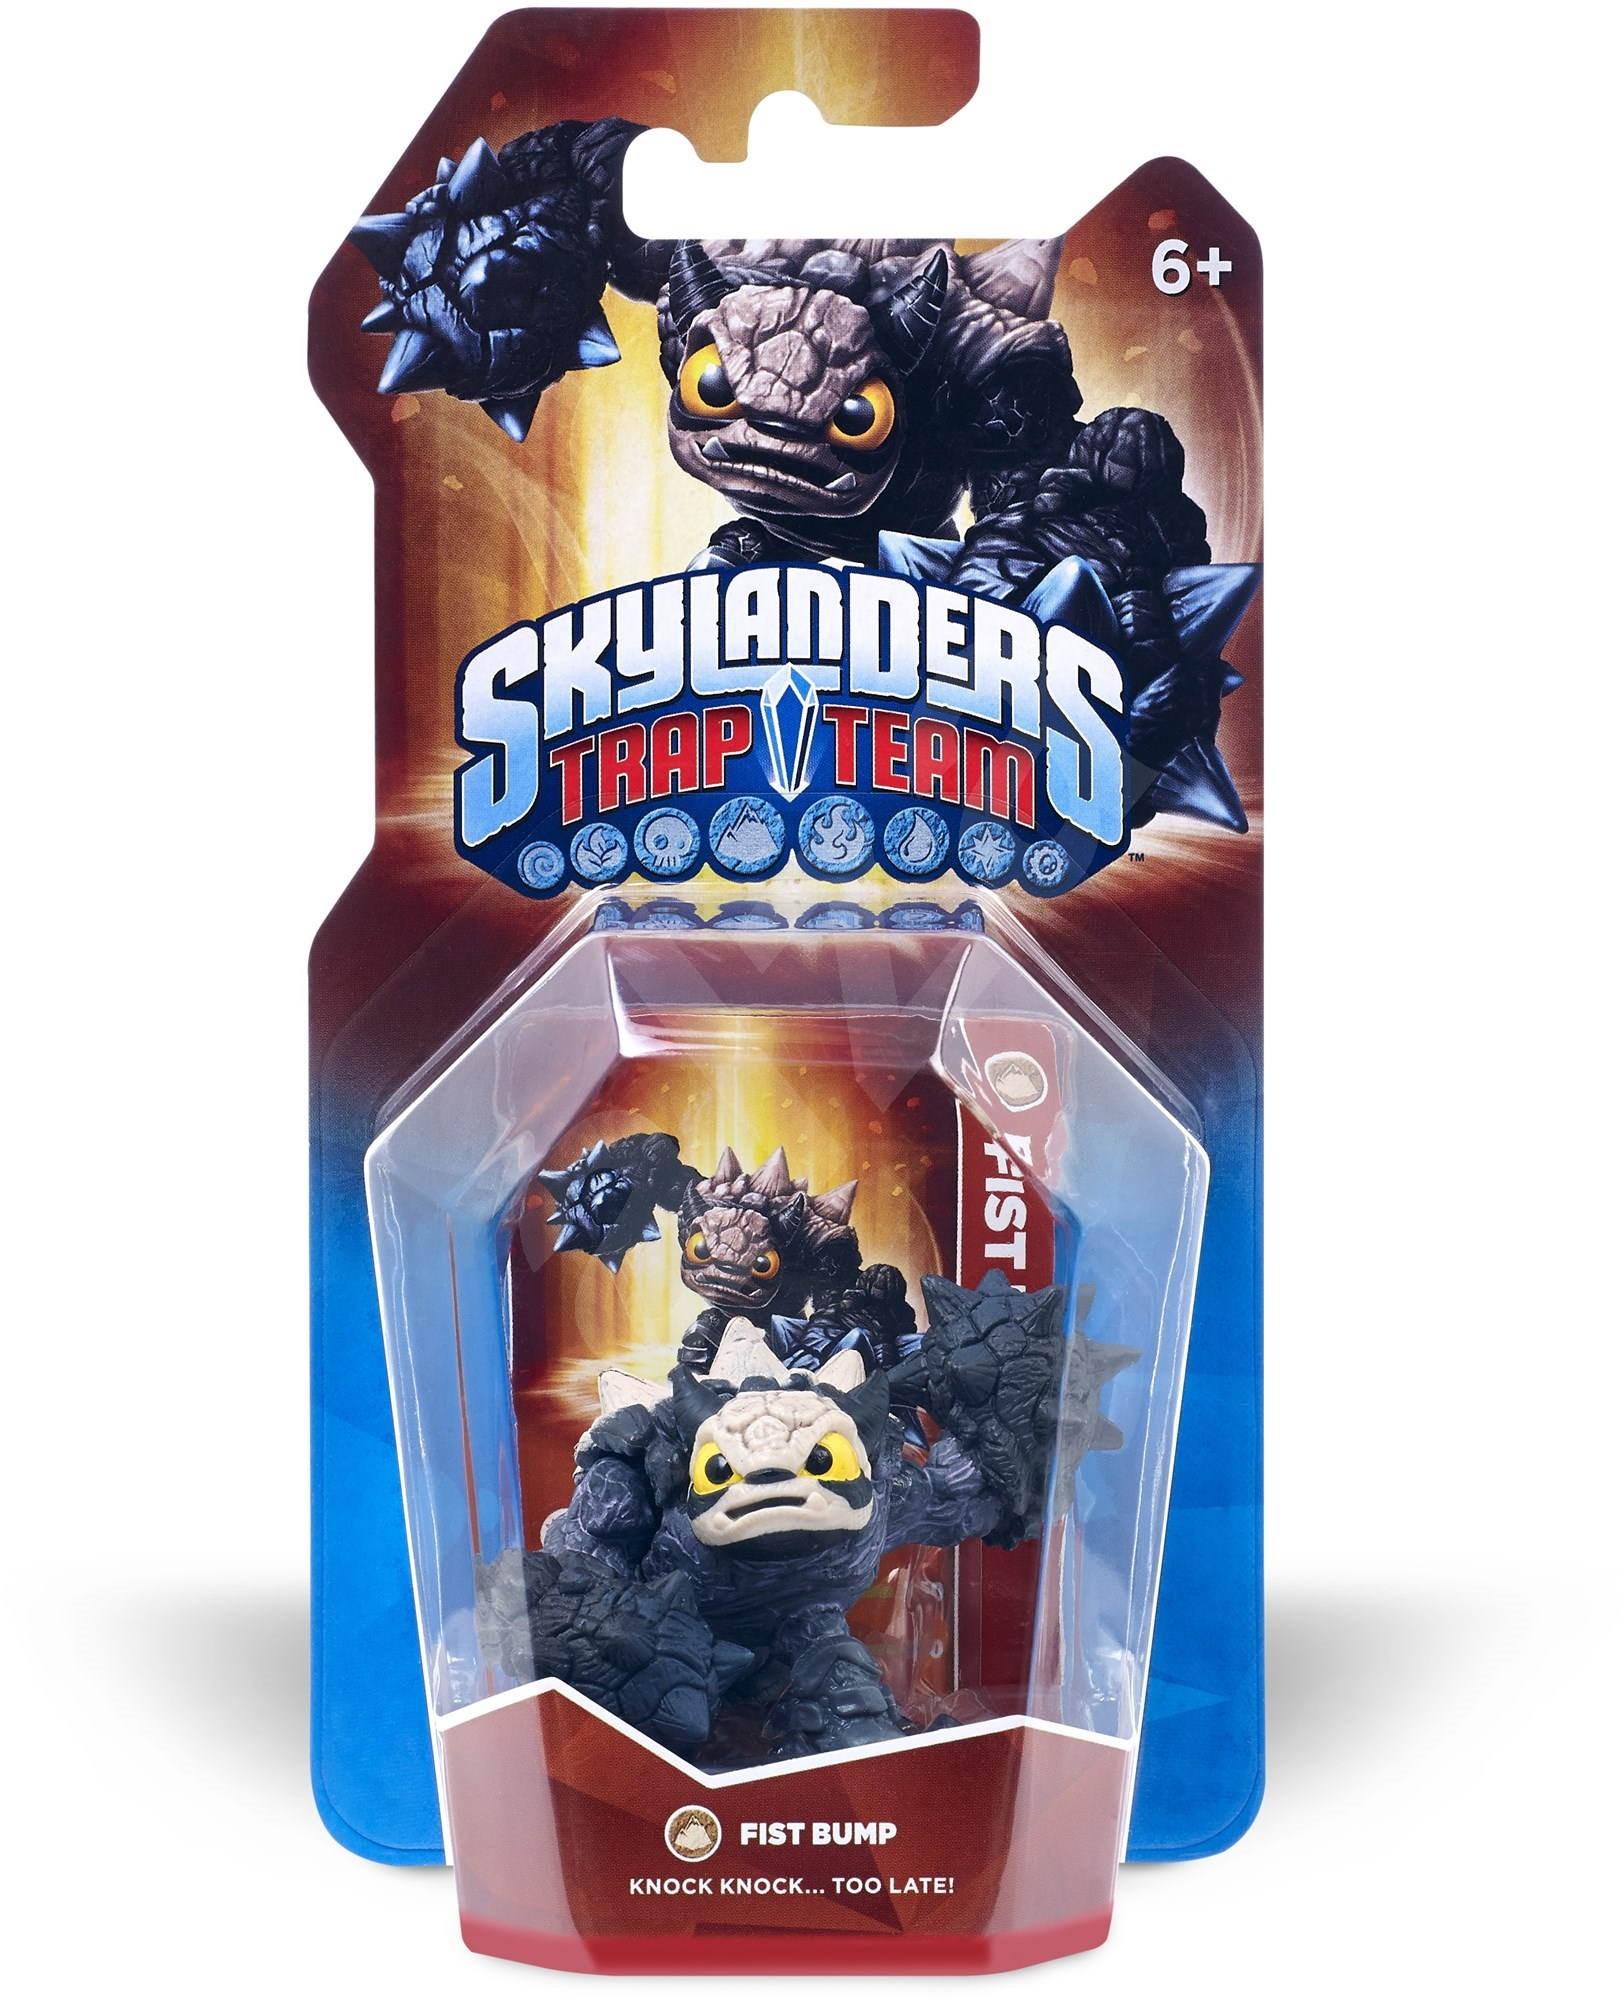 Skylanders: Trap Team - Fist Bump - Figures | Alzashop.com